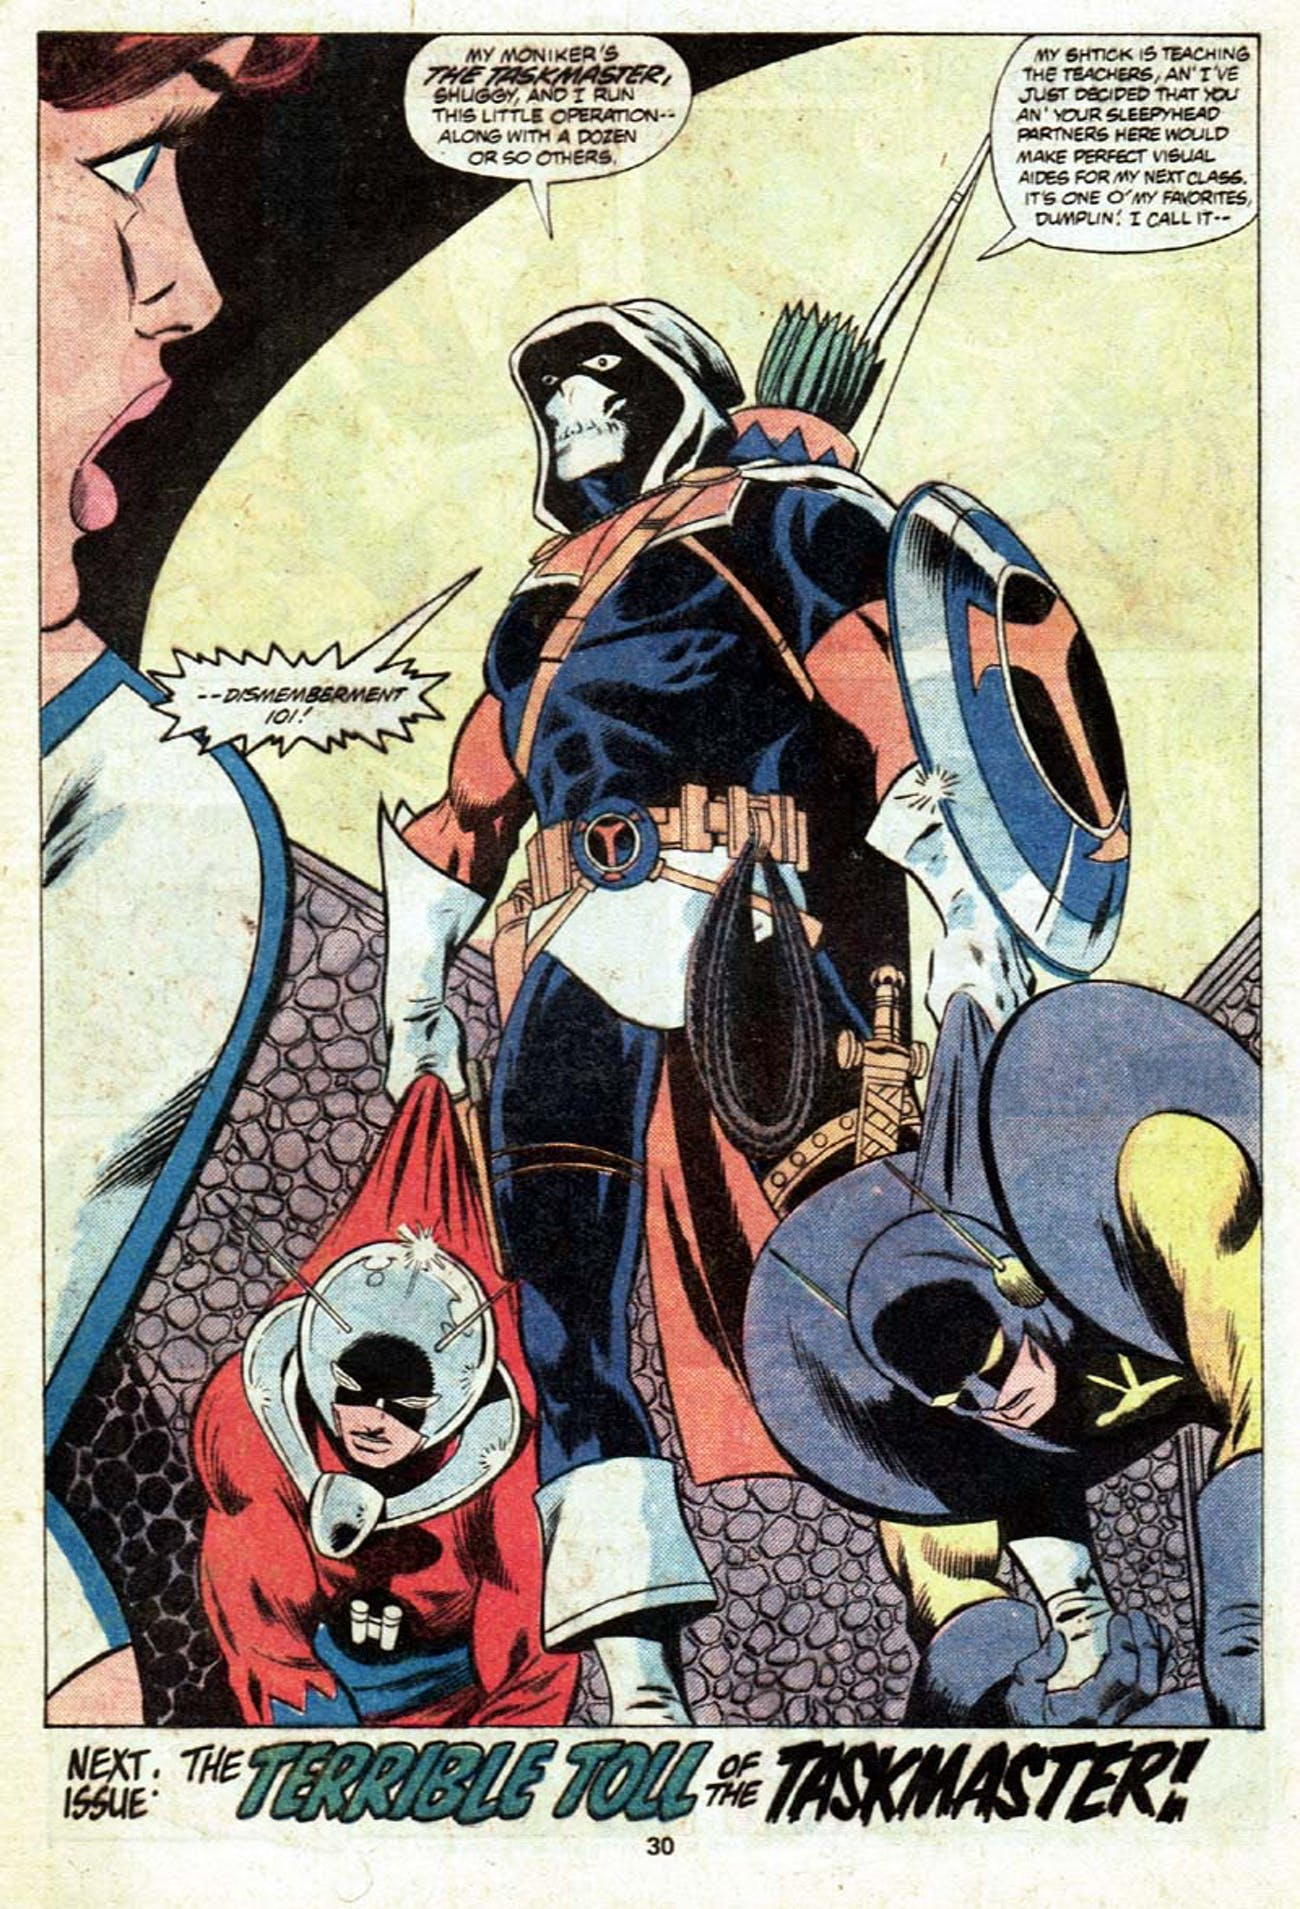 The Taskmaster Marvel